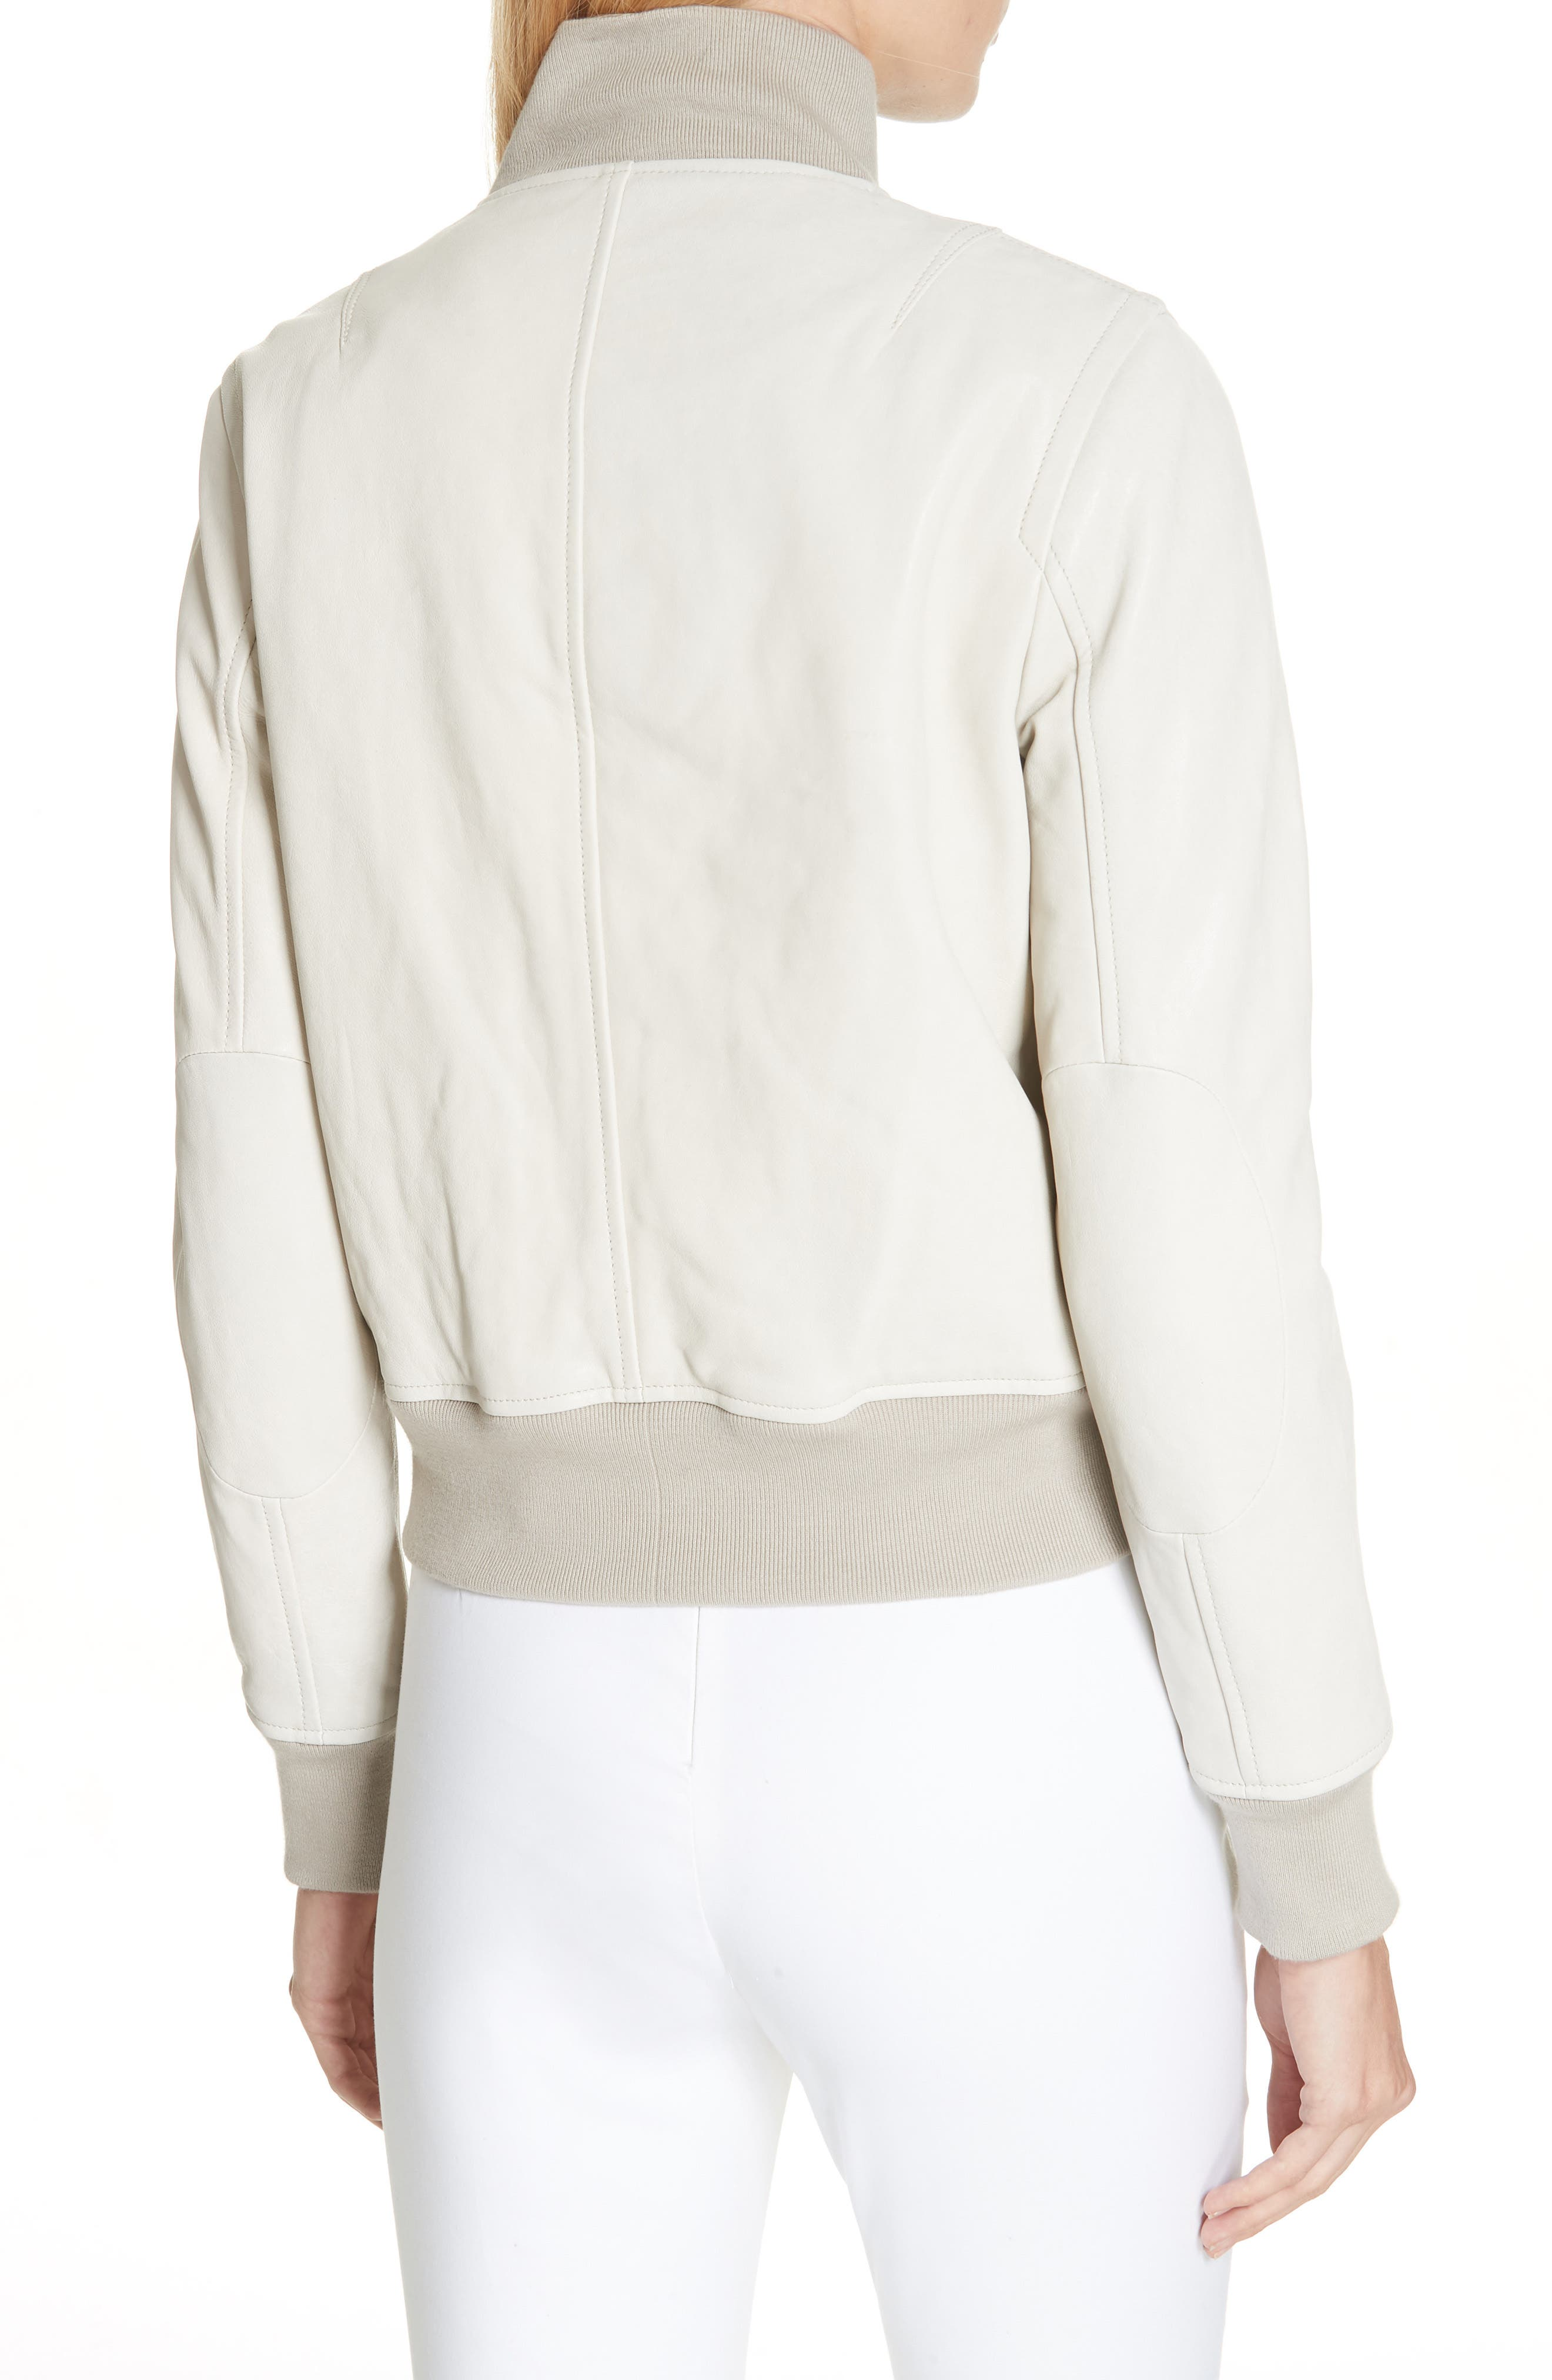 Mila Lambskin Leather Jacket,                             Alternate thumbnail 2, color,                             IVORY